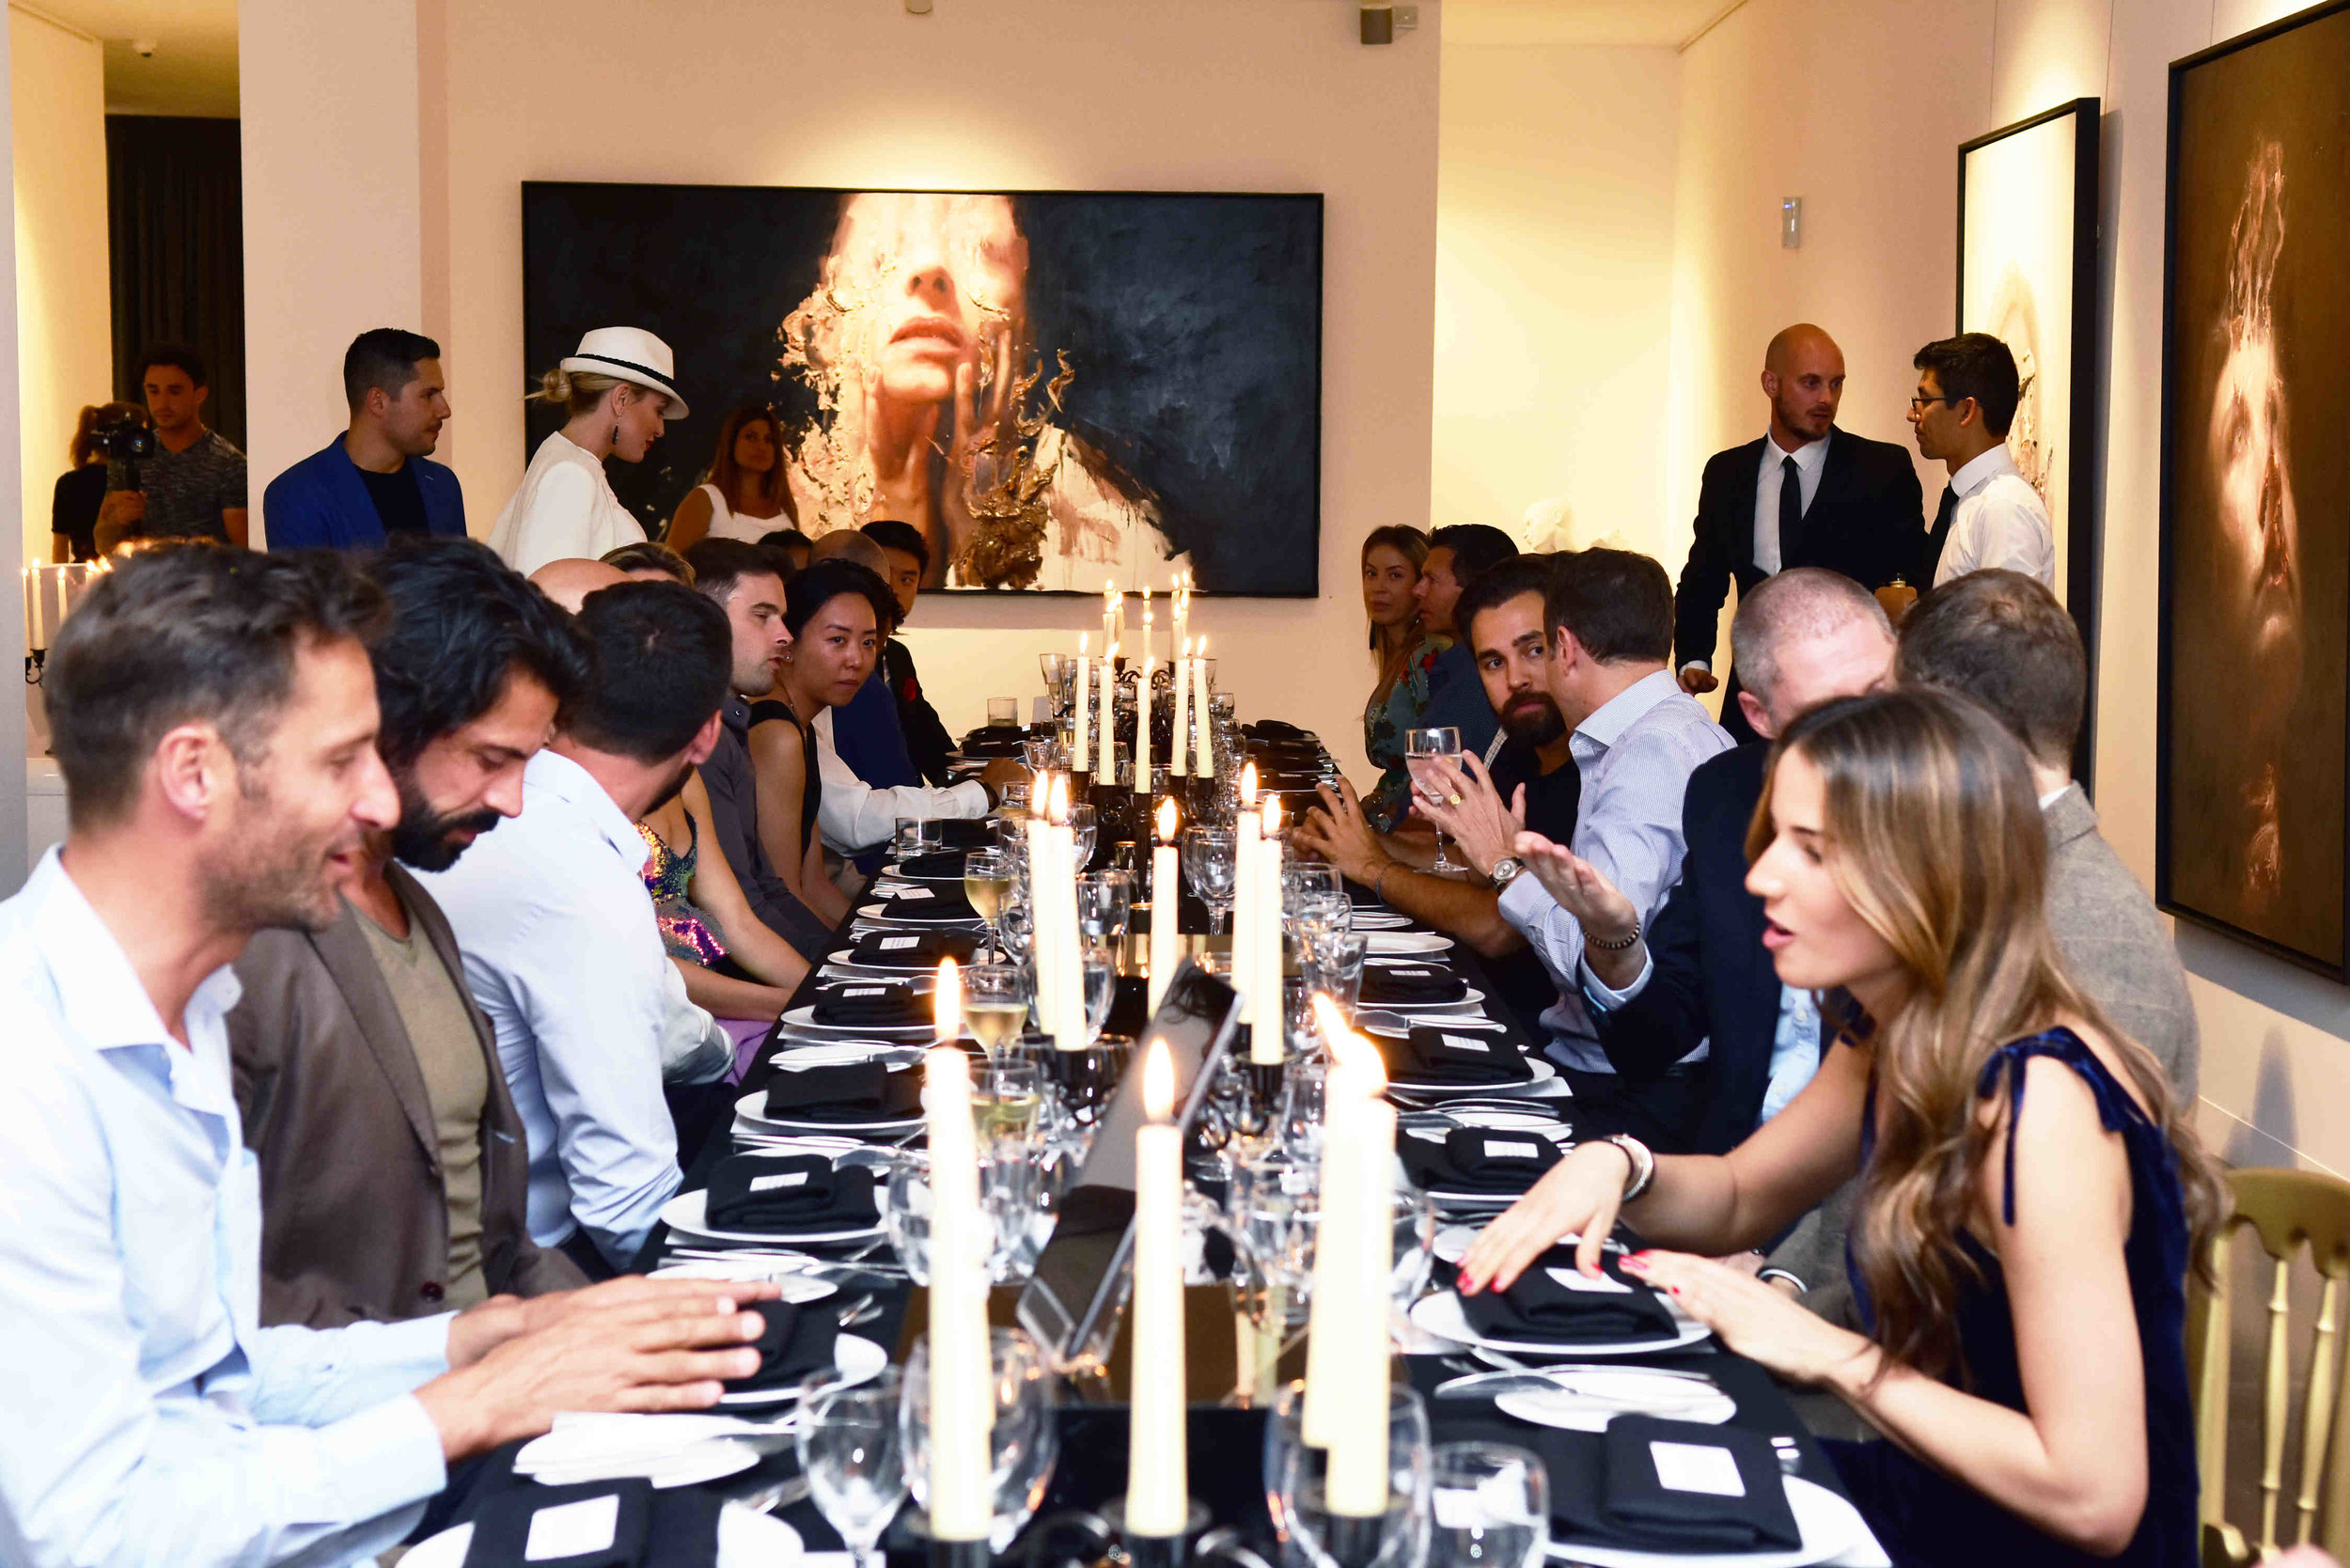 Anne Marie JD Malat dinner party © Joe Alvarez 18215.JPG